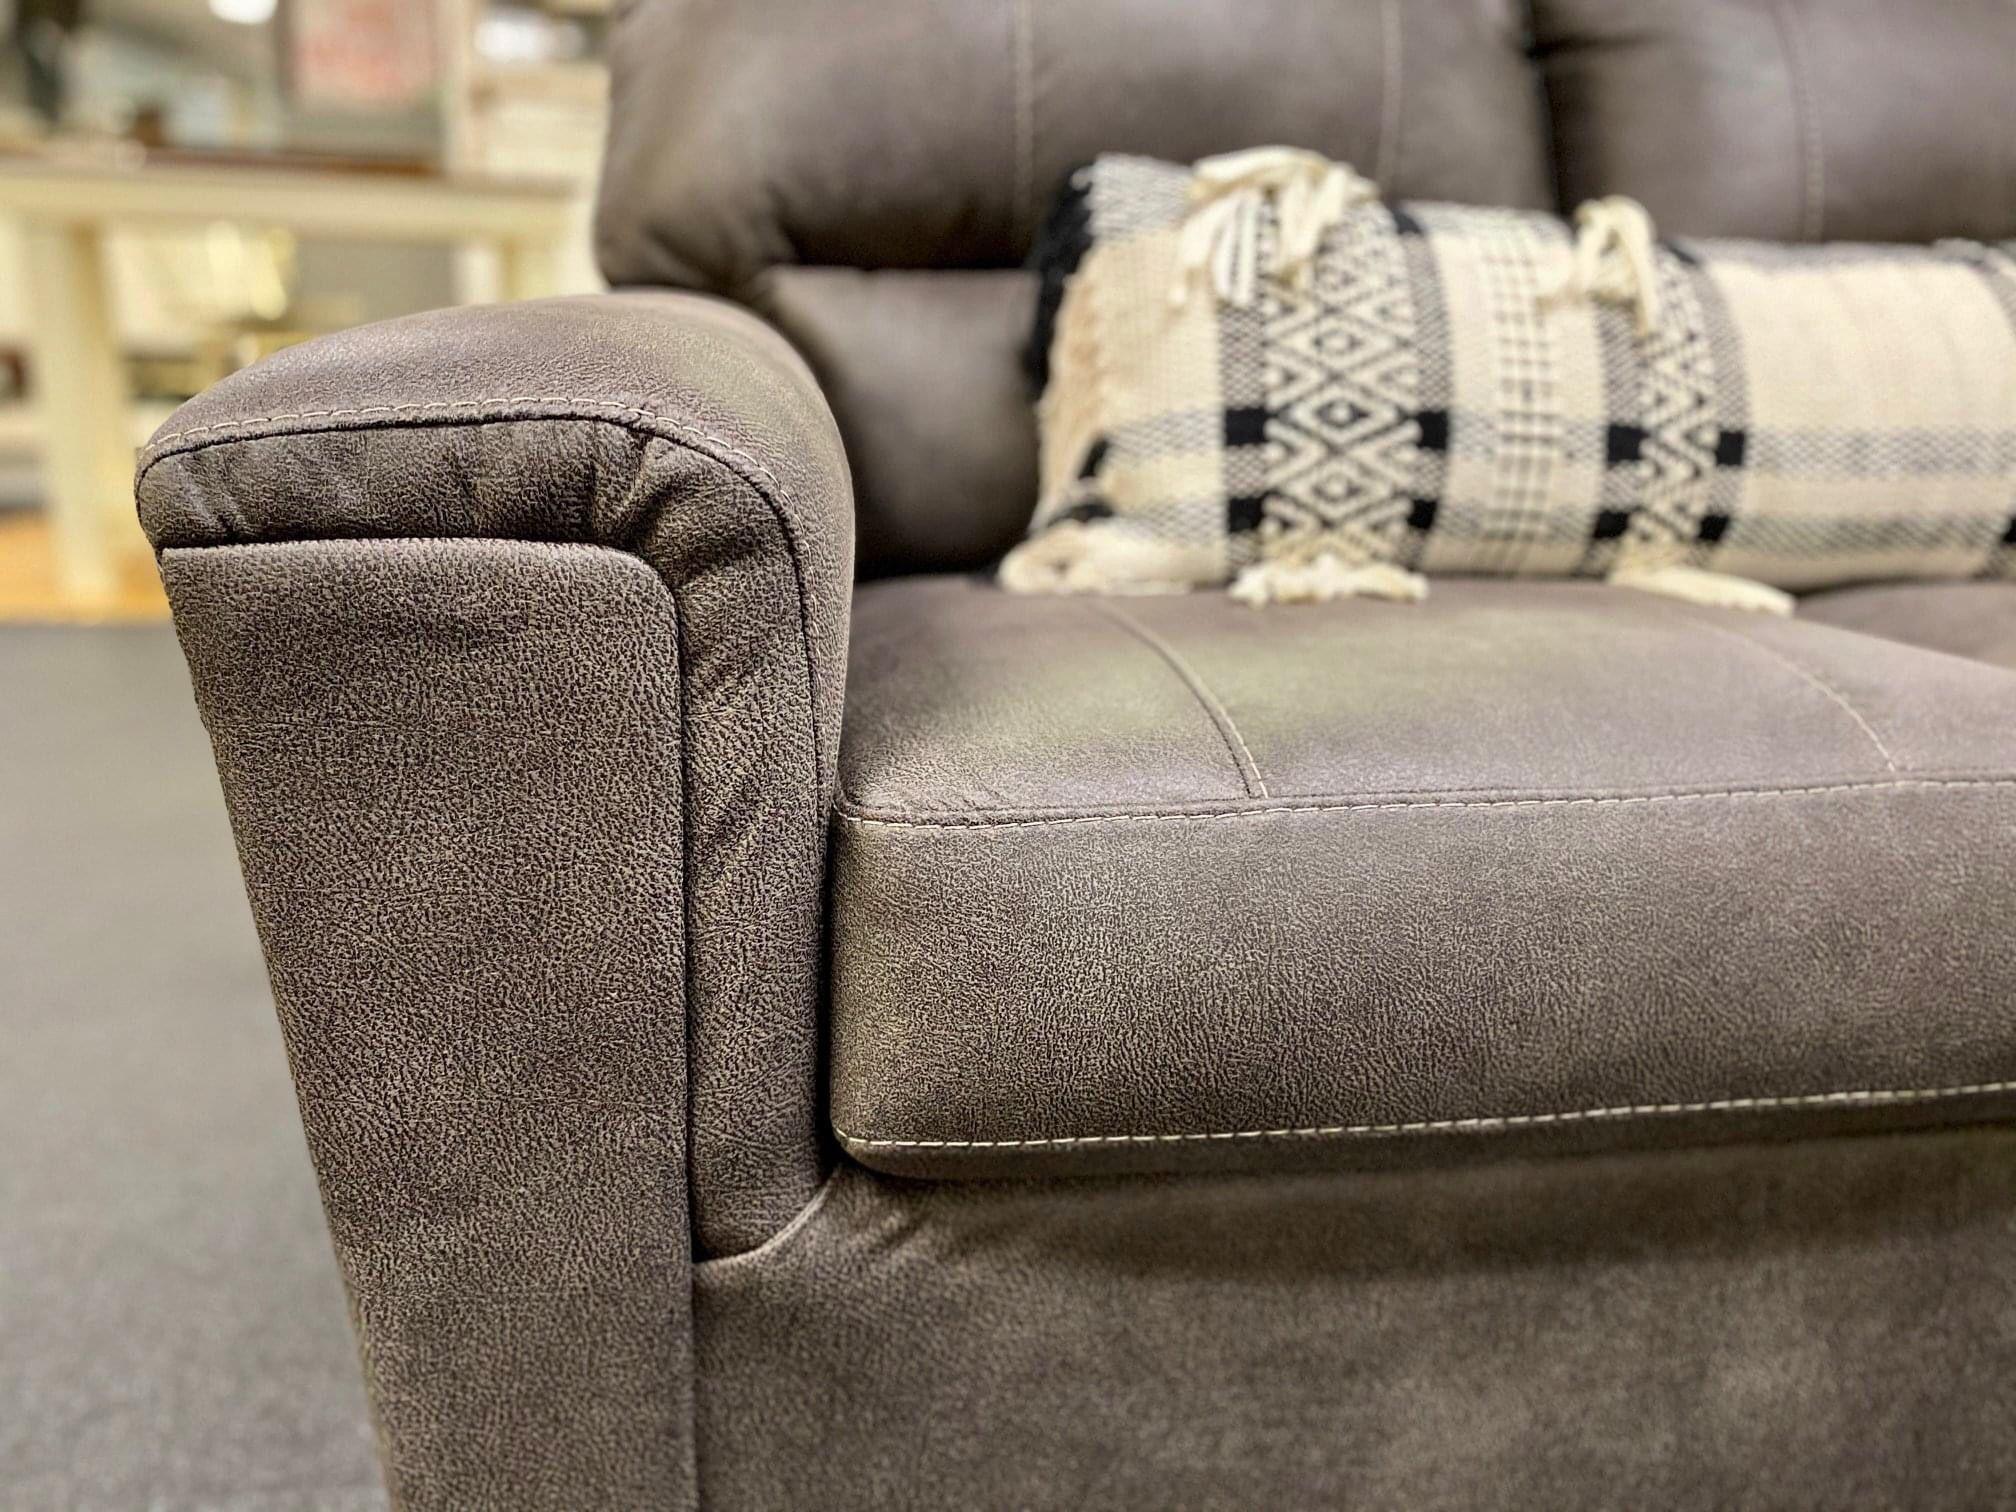 Navi Smoke or Chestnut Living Room Set /couch /Living room set